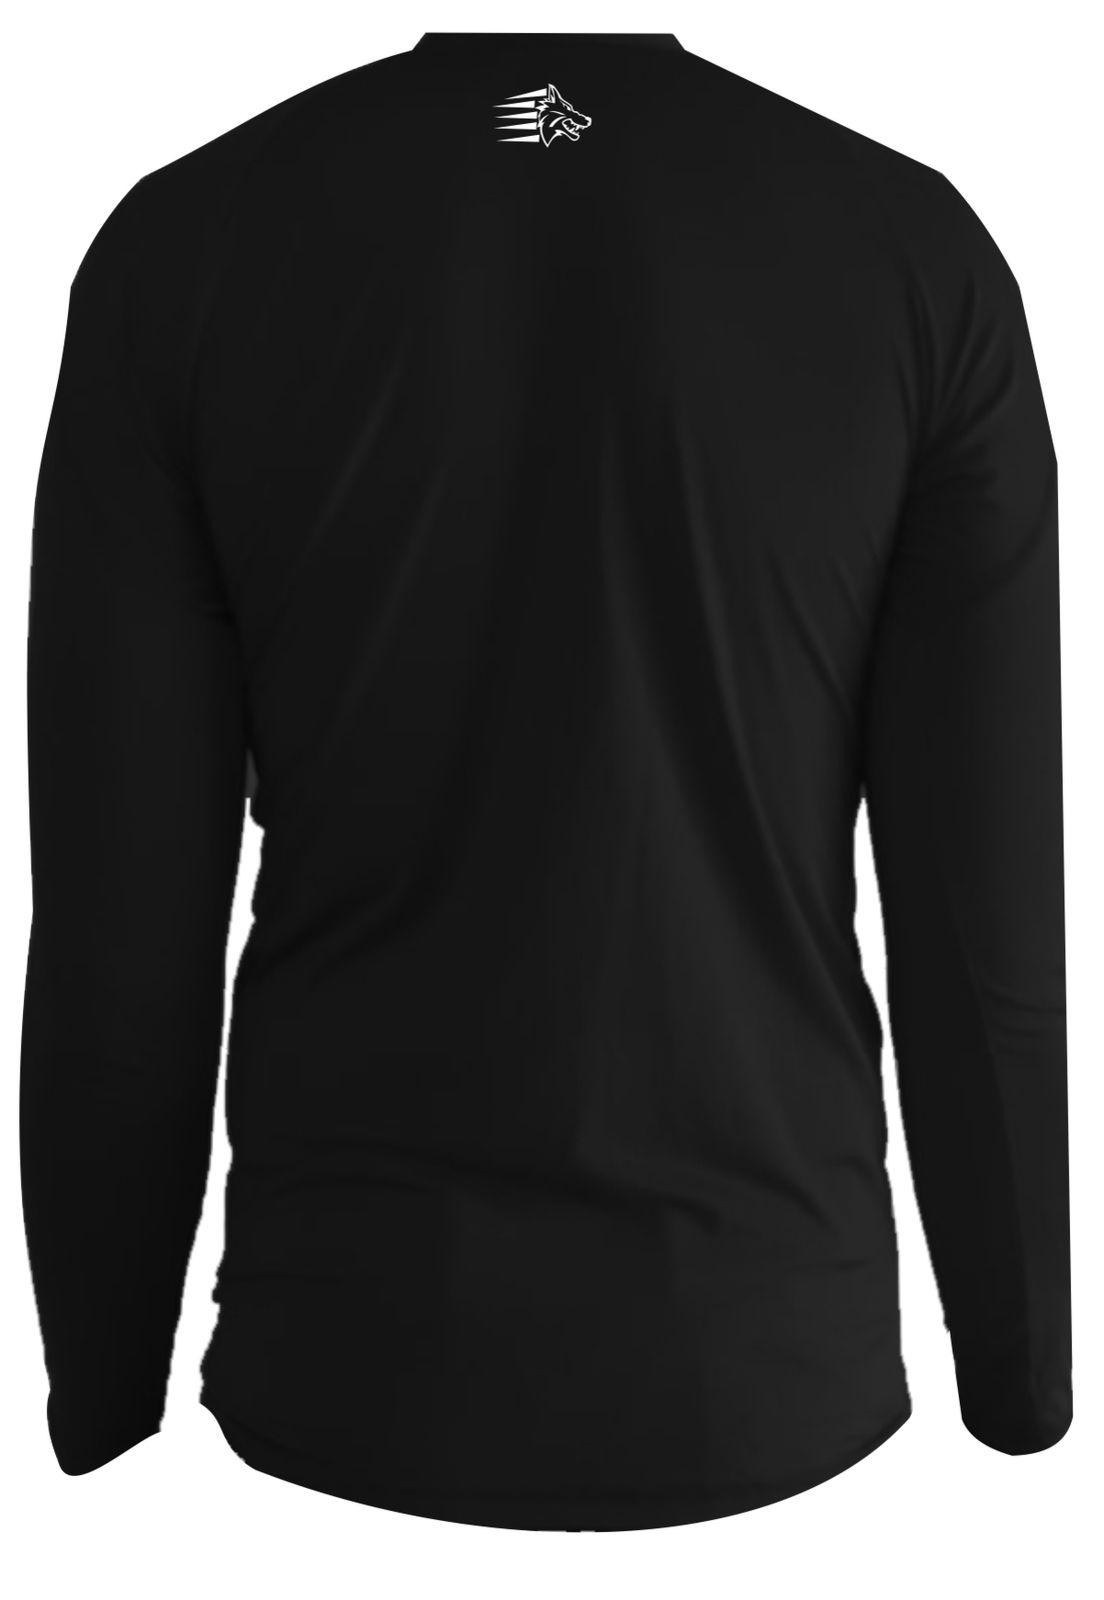 Camisa Térmica Manga Longa Masculina UV 50+  Uppercut